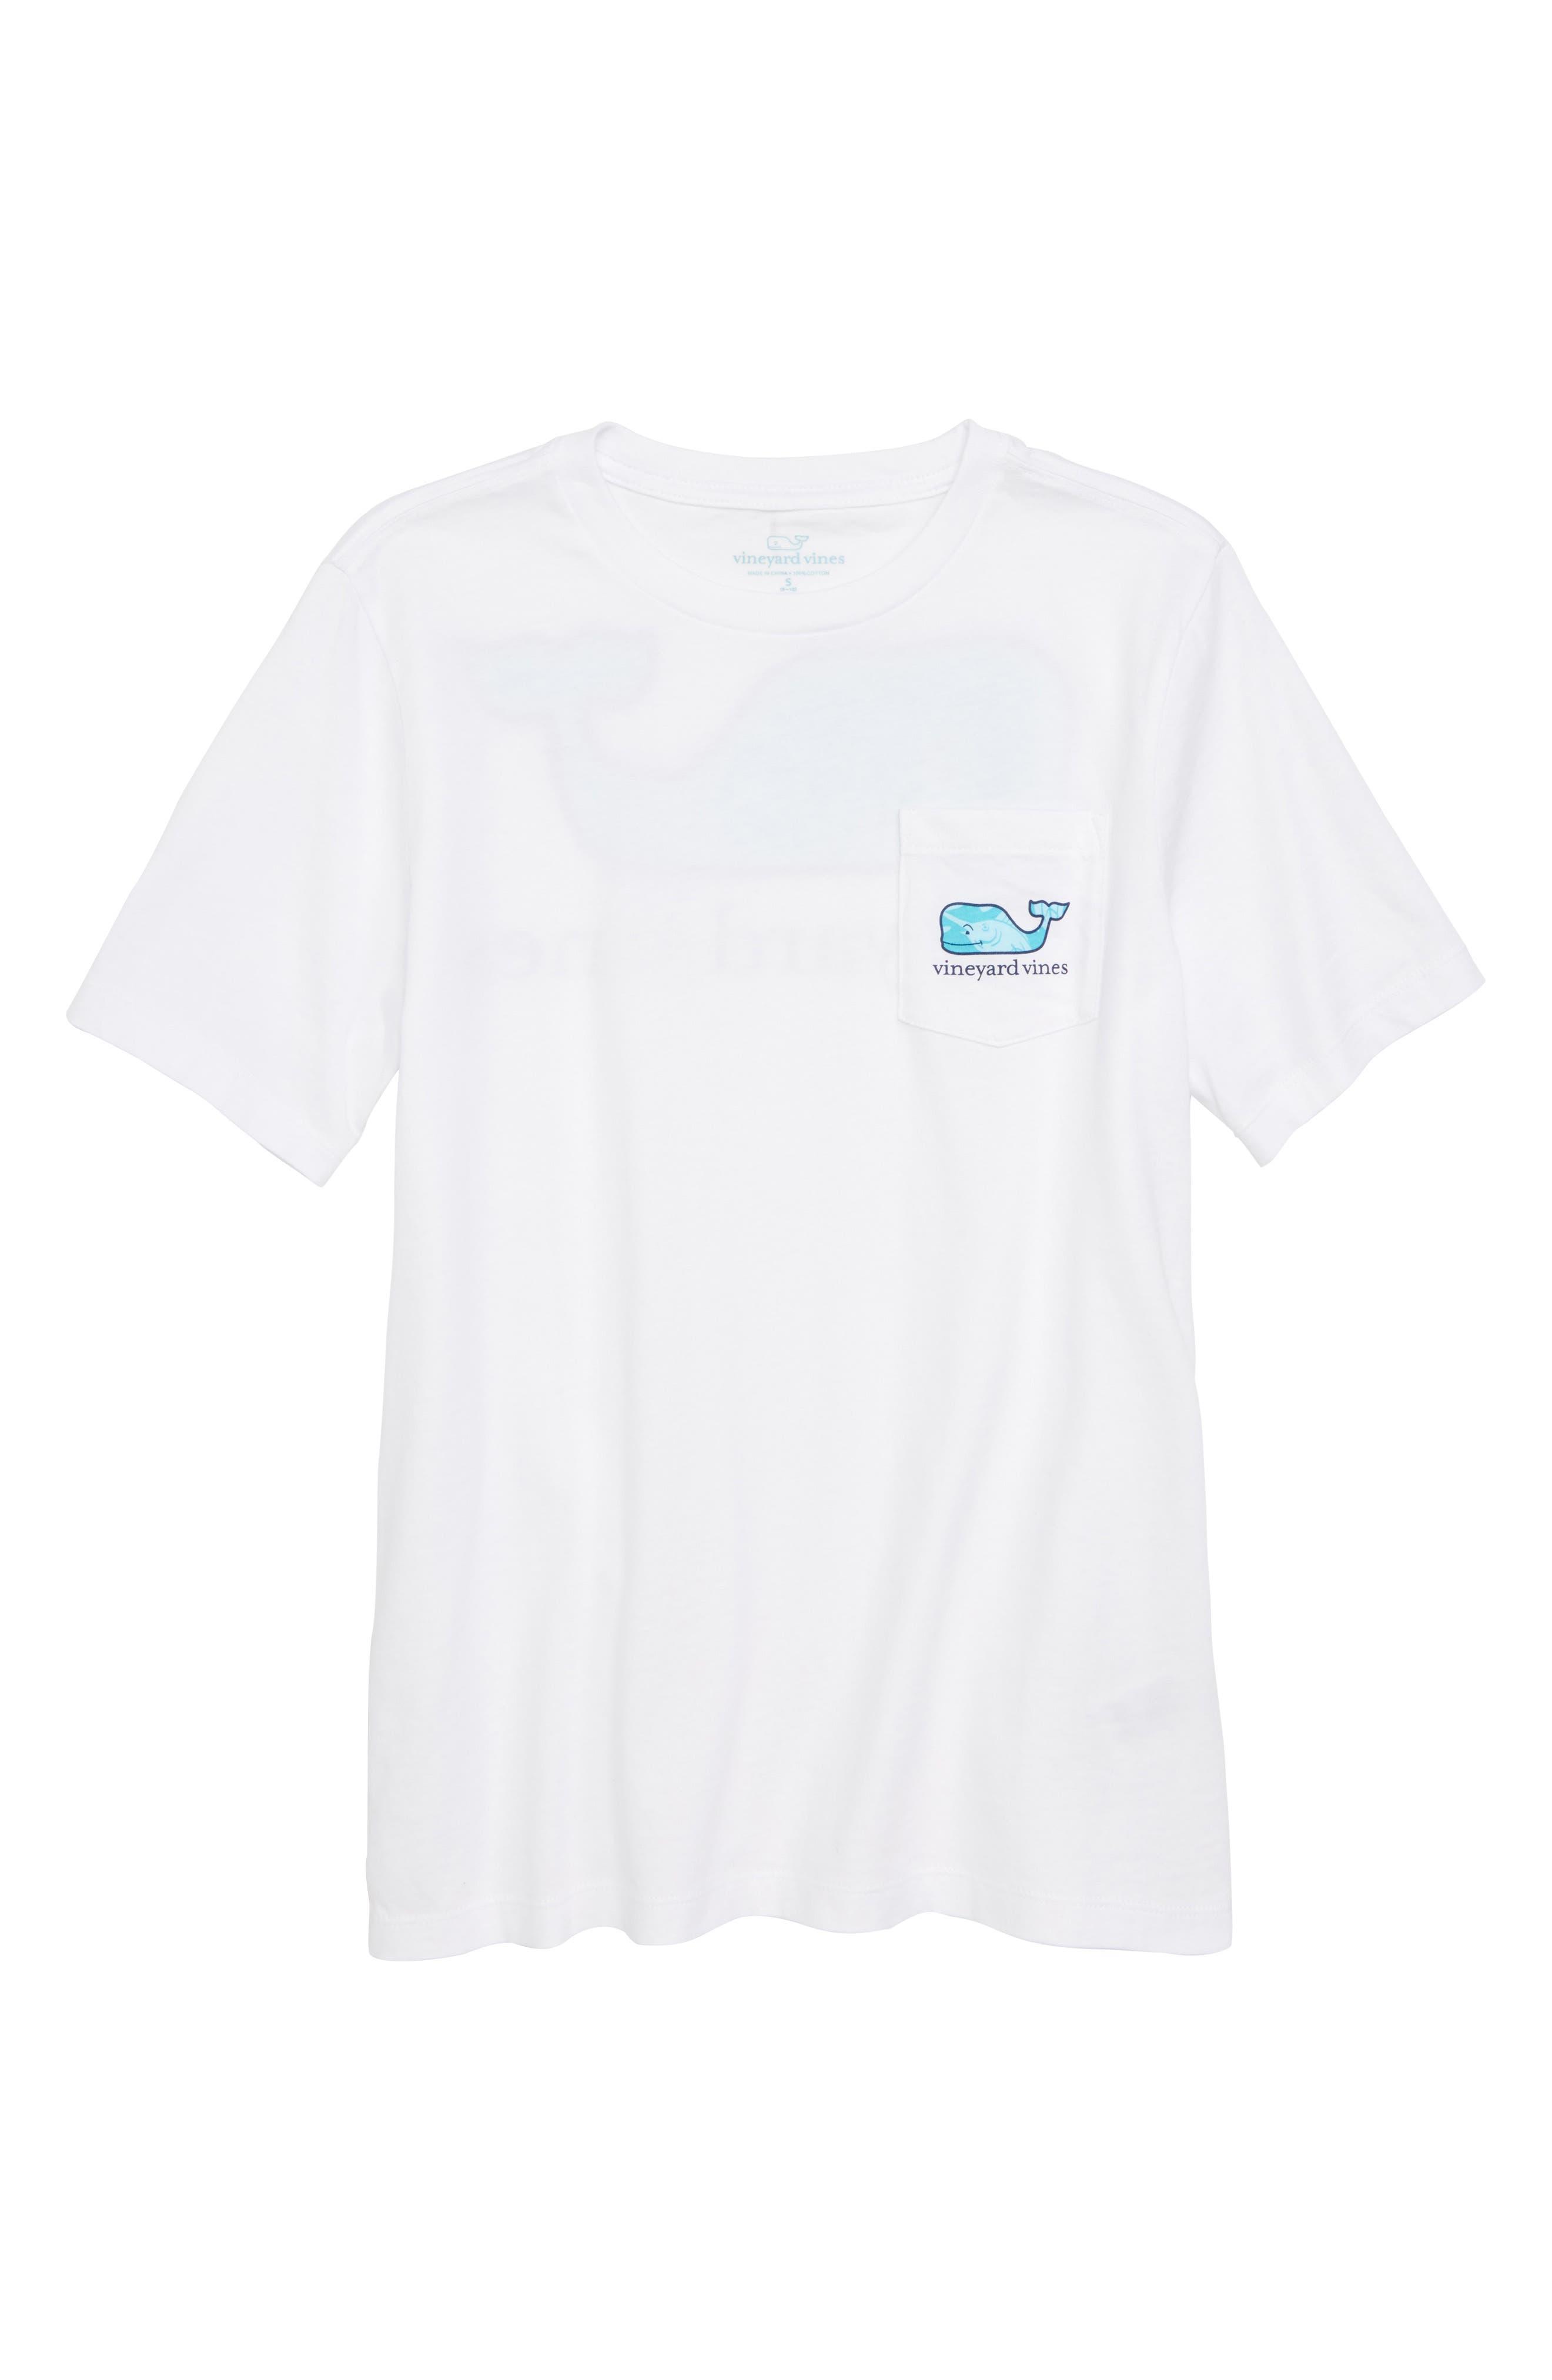 Marlin Whale Graphic T-Shirt,                             Main thumbnail 1, color,                             White Cap